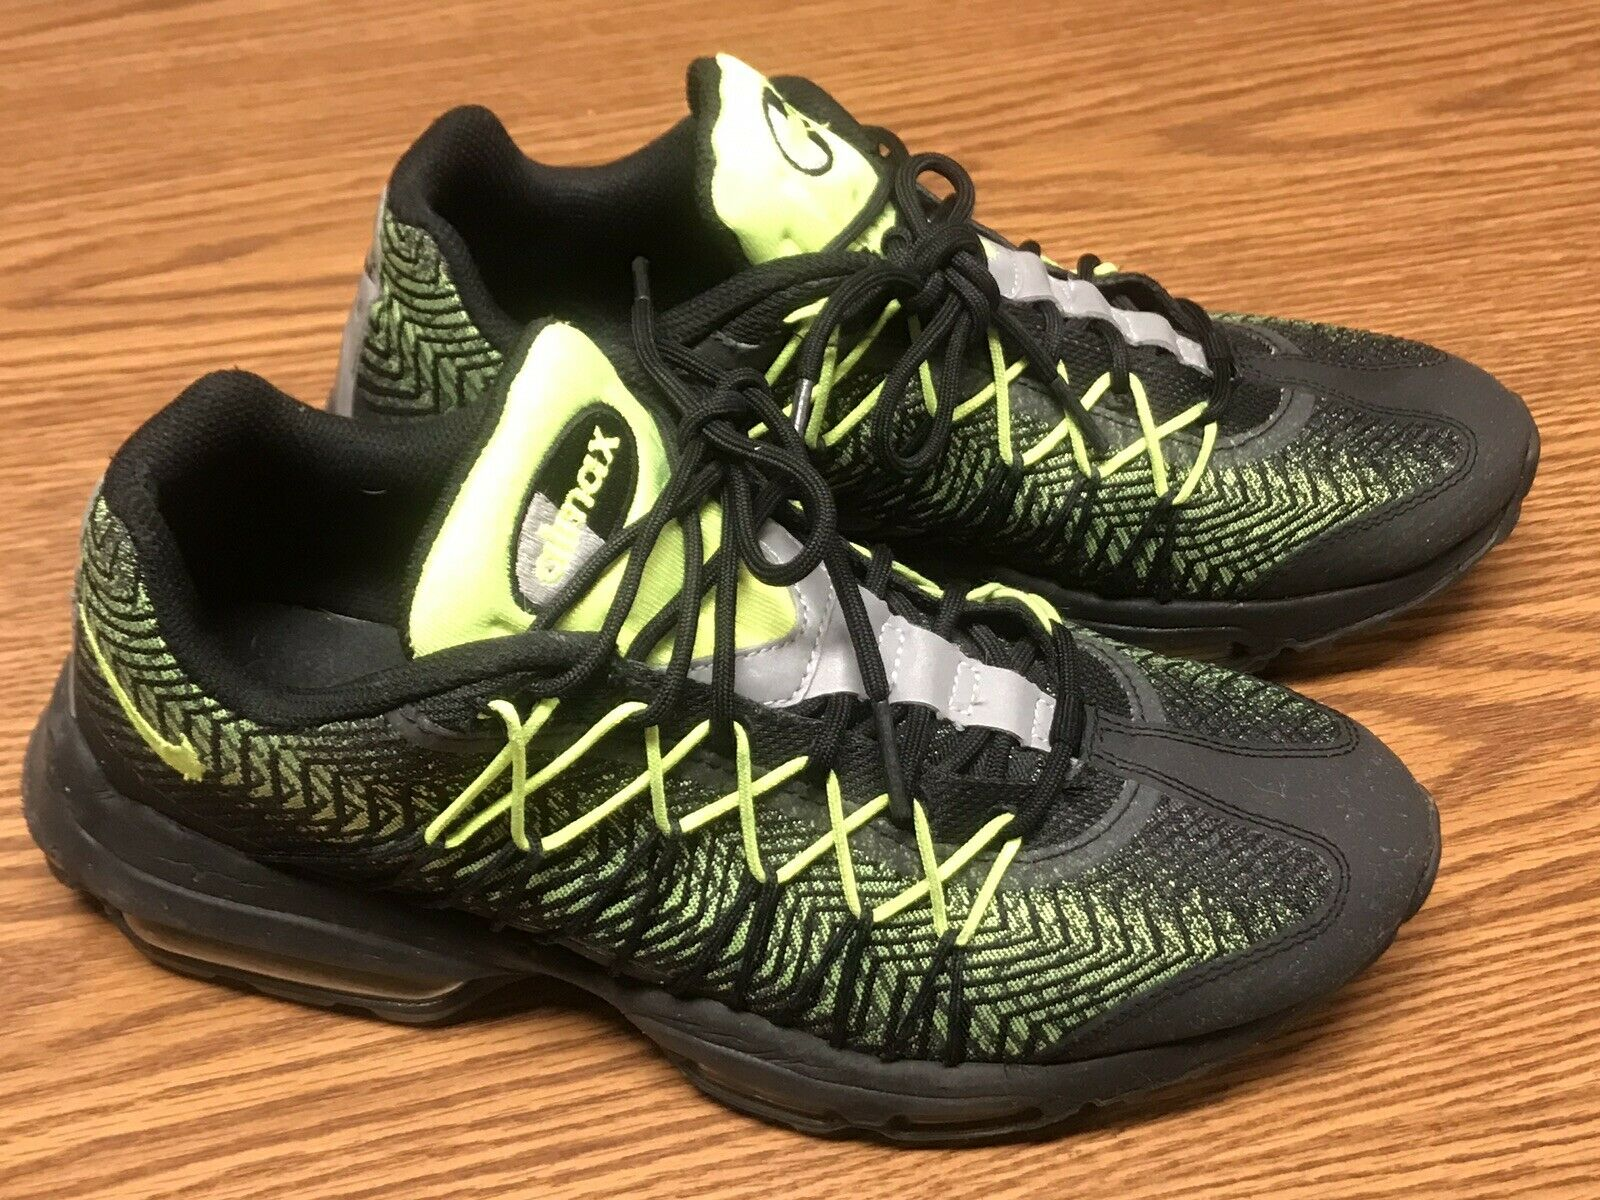 Nike 749771-007 Mens Air Max 95 Ultra Jacquard Black Volt Running shoes Sz 8 RARE